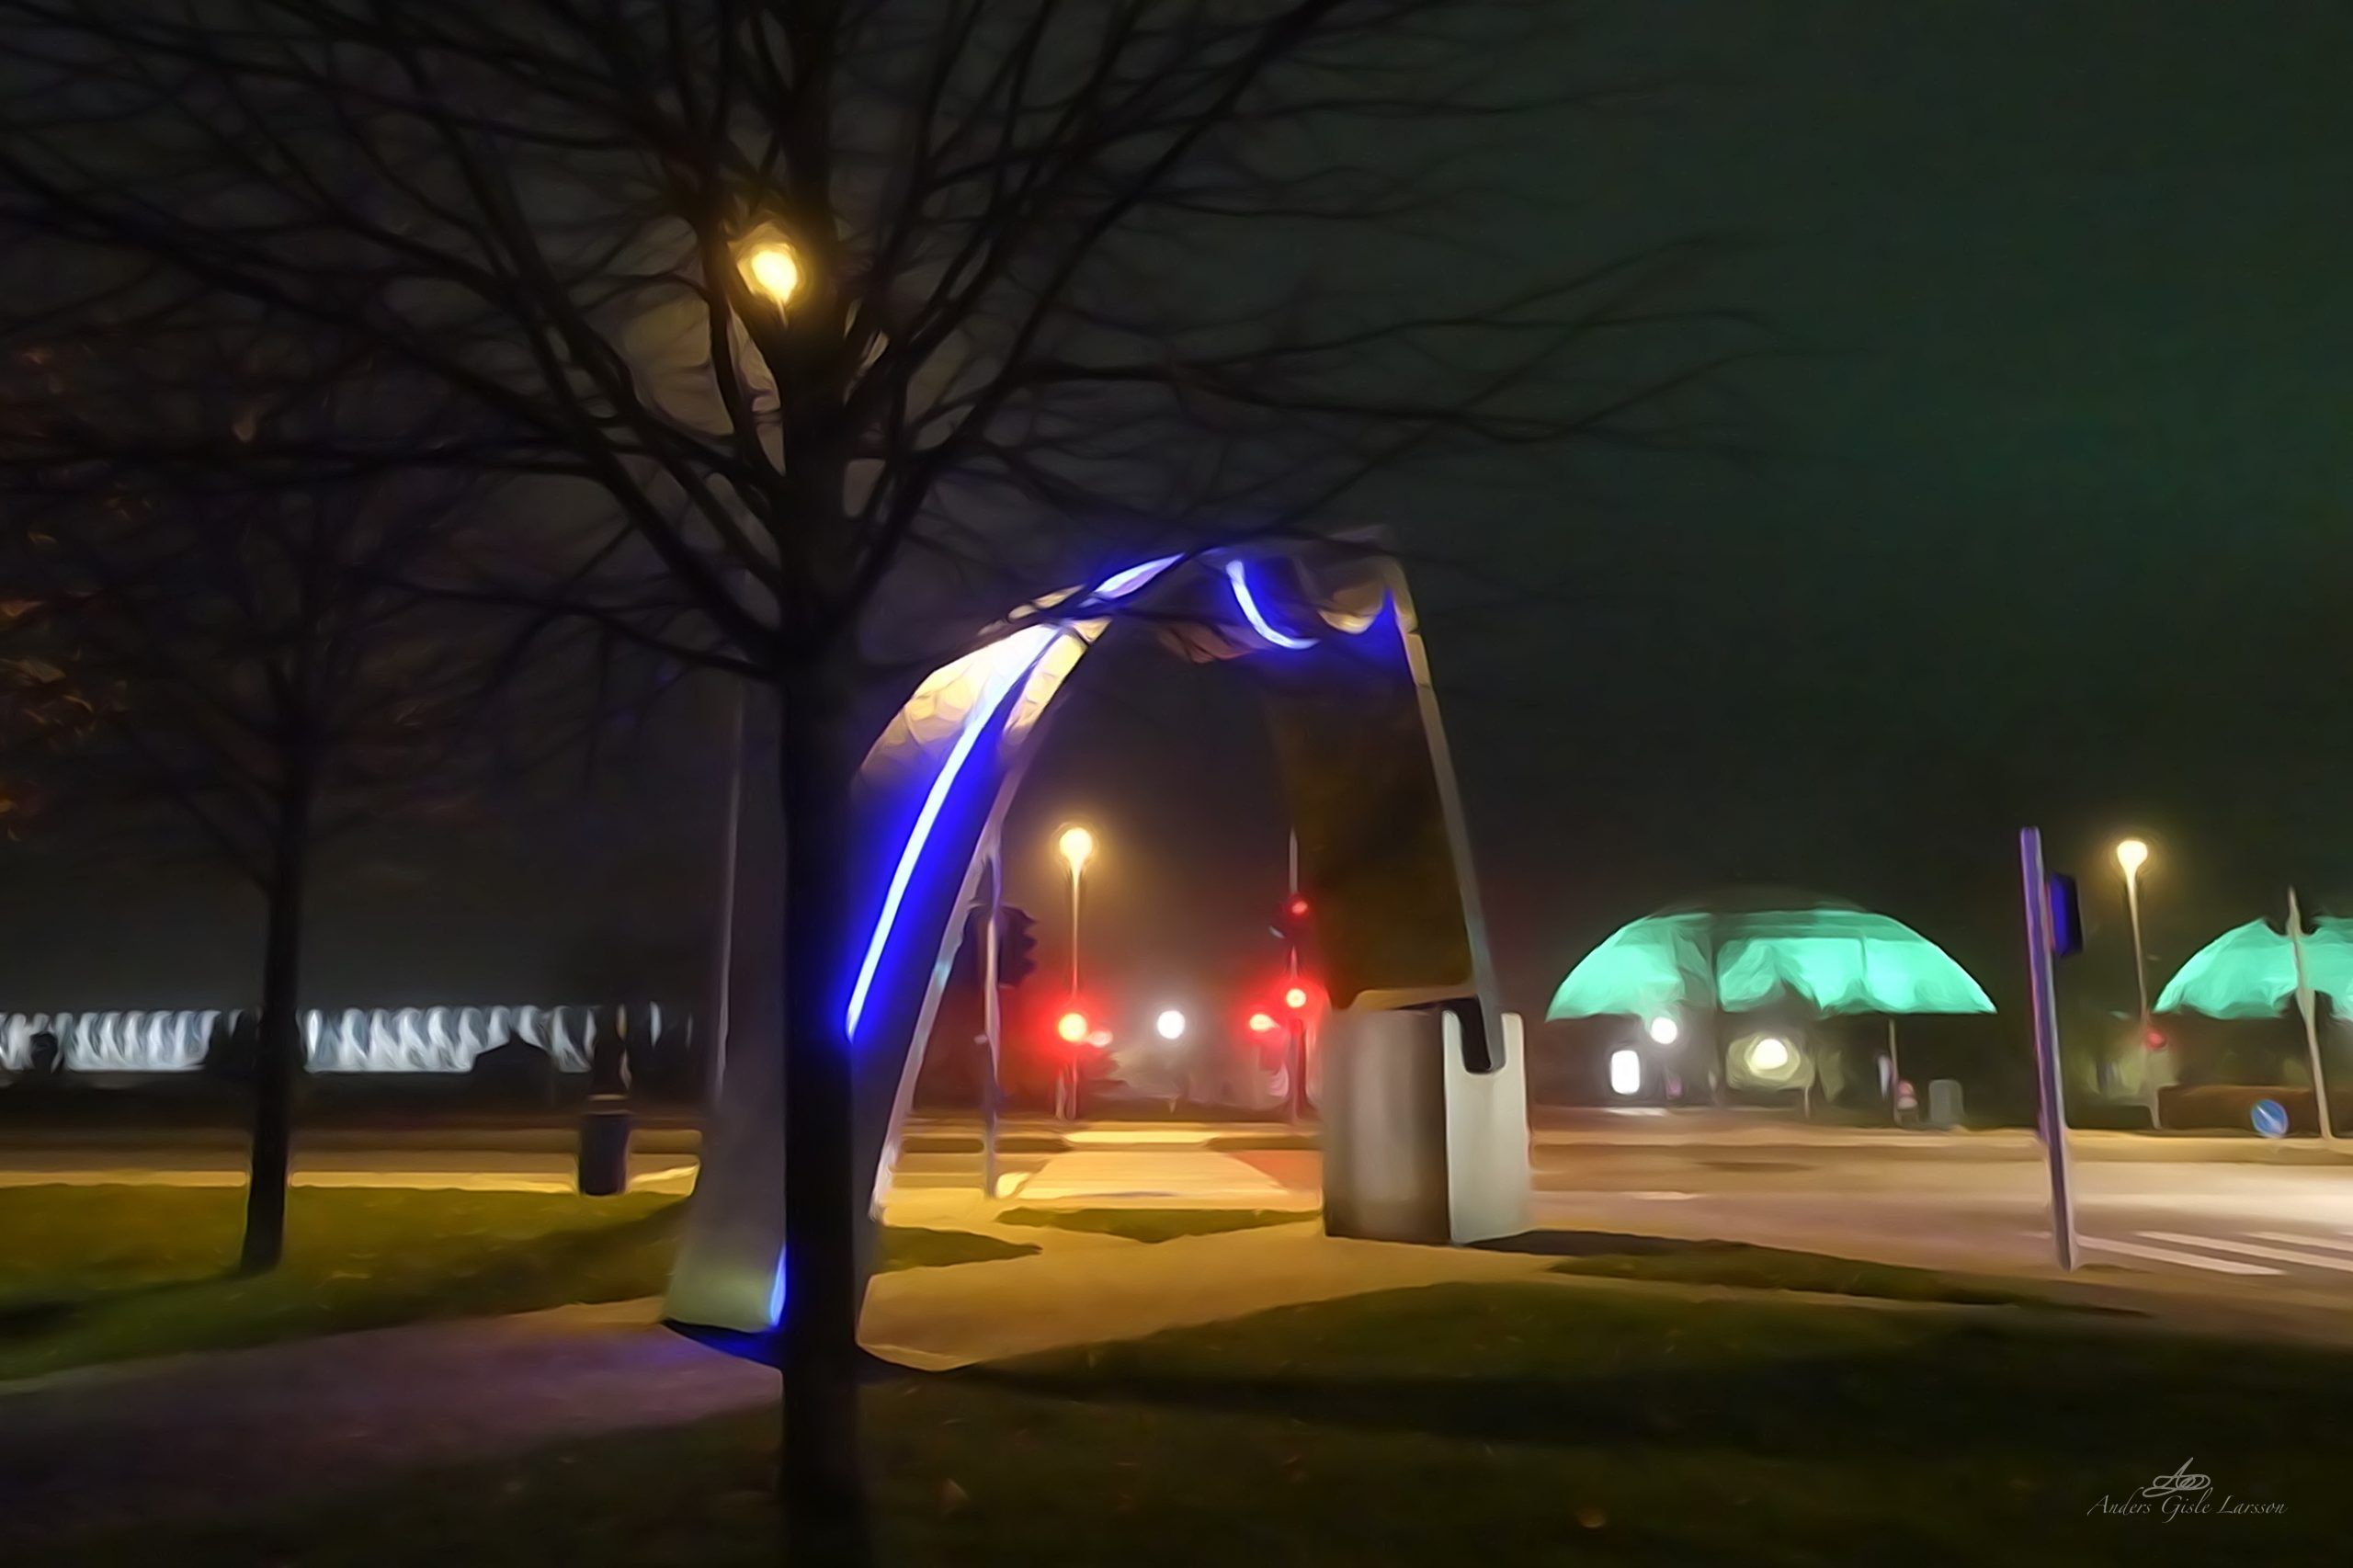 Byens Lys, 310/365, Uge 45, Laksetorvet, Randers